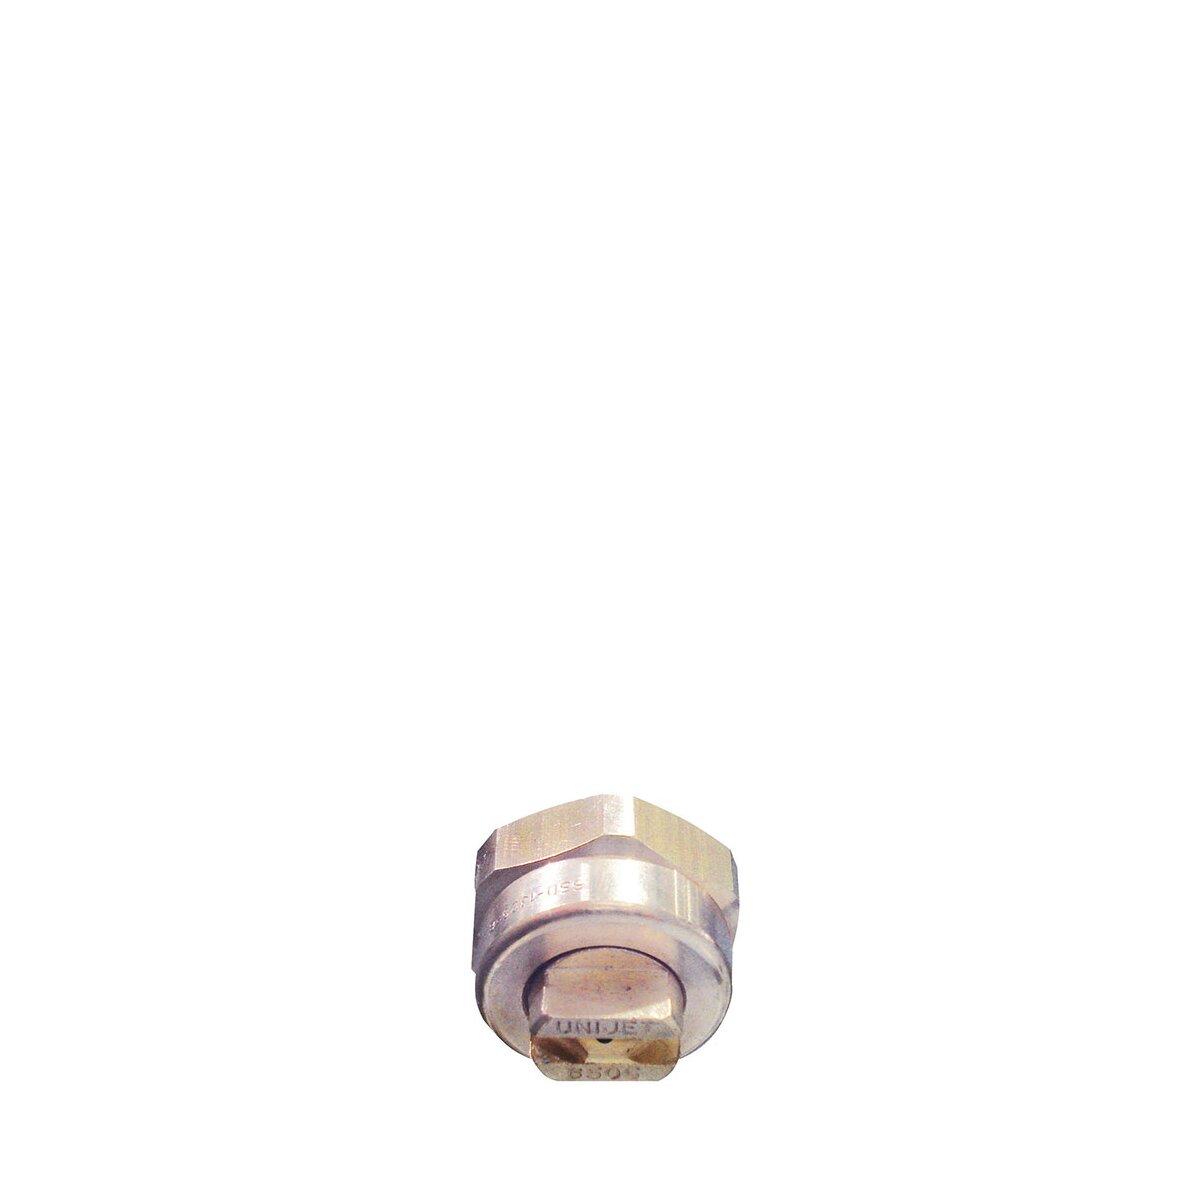 20Stk Edelstahl M8 Hex  Kappe Nut Ventil Abdeckung Befestigung Silber